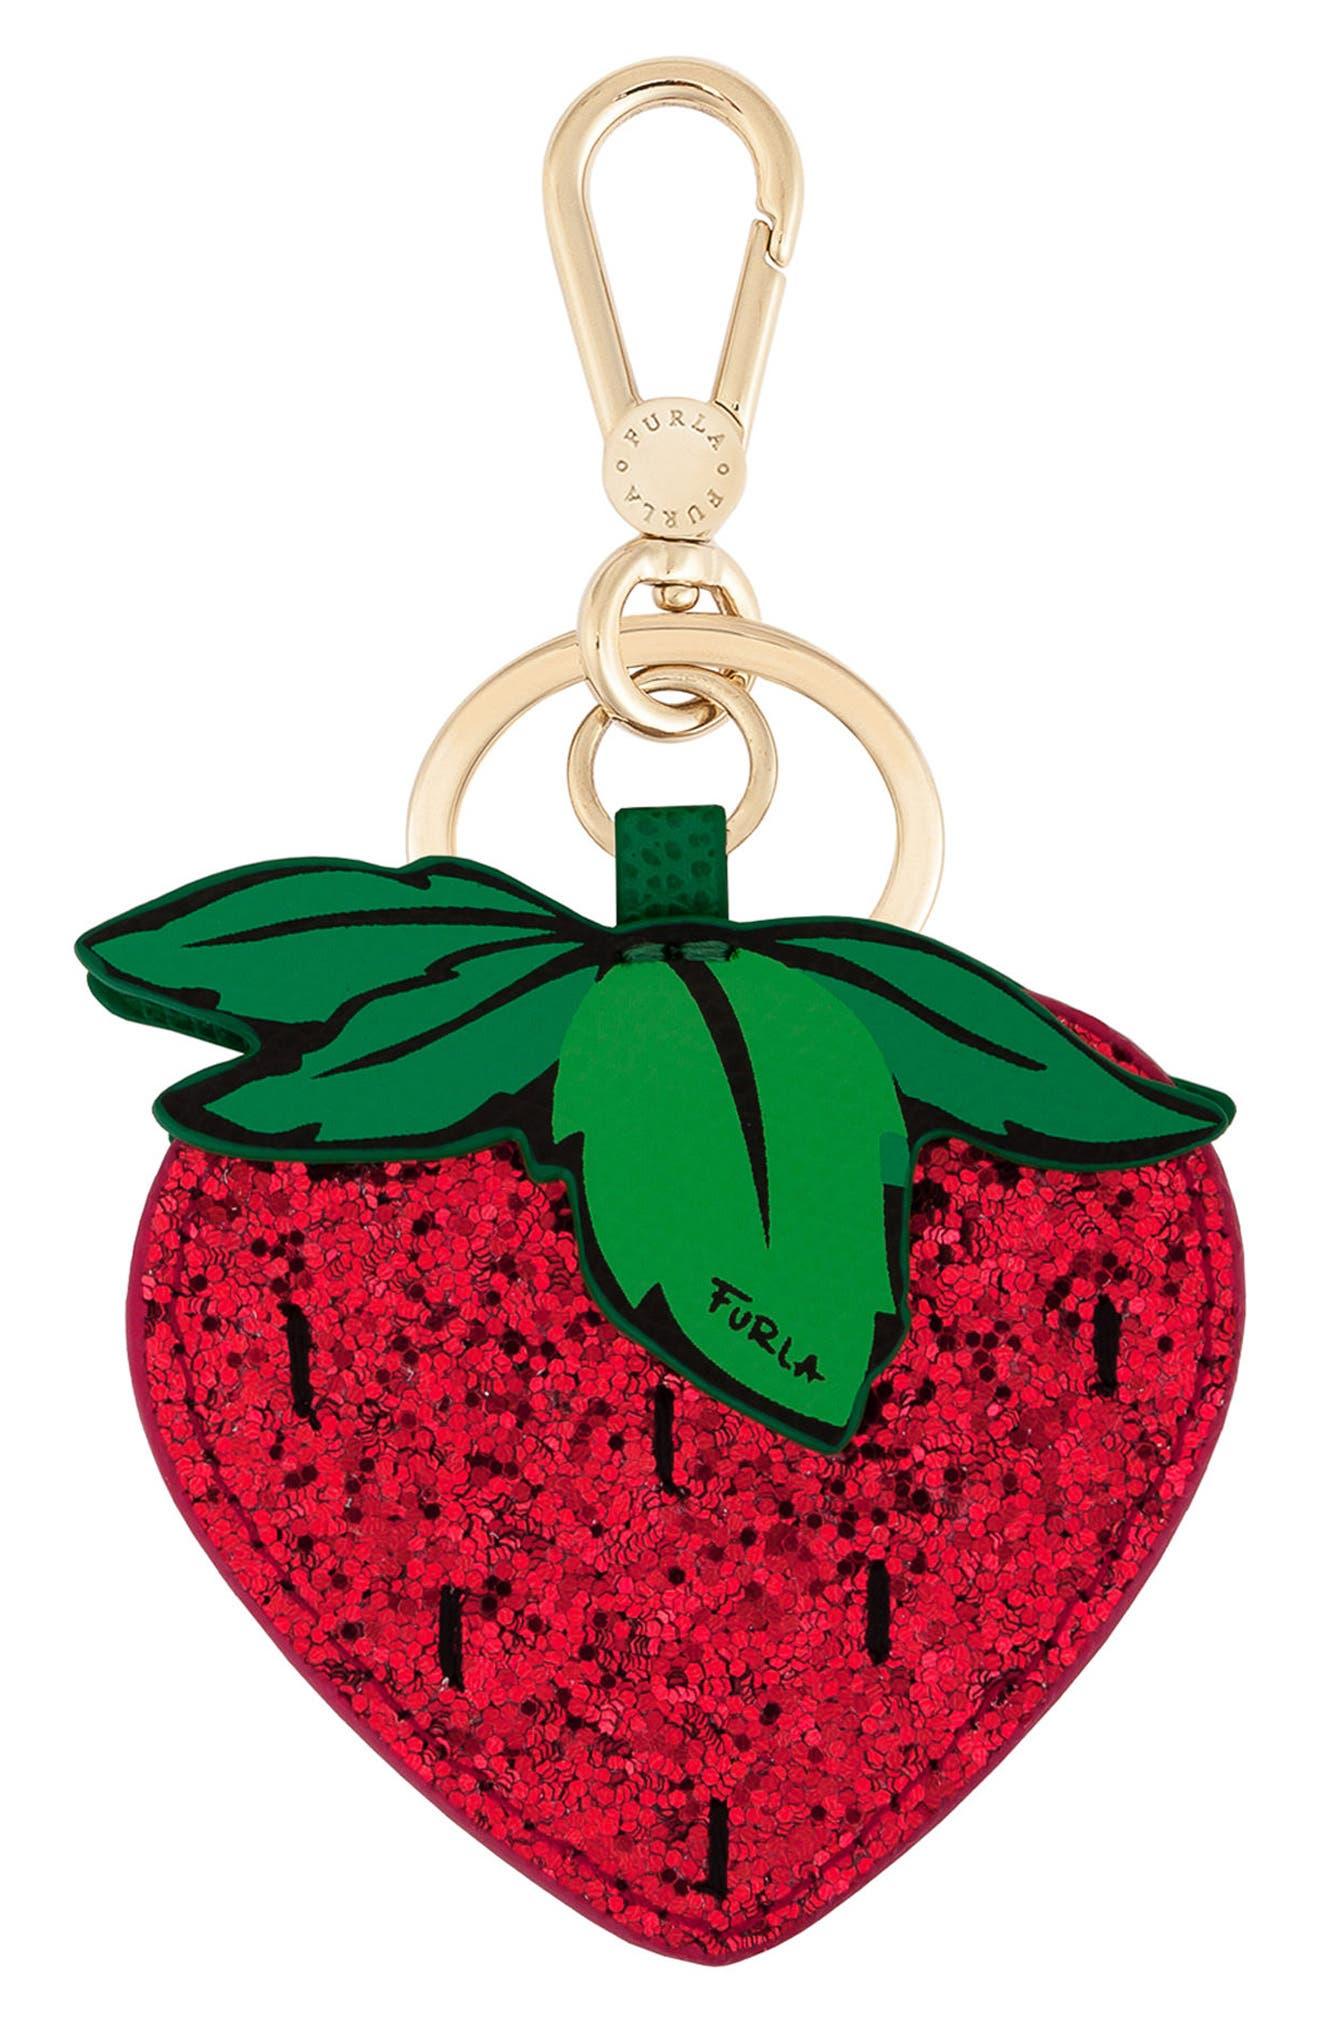 Furla Strawberry Glitter Bag Charm